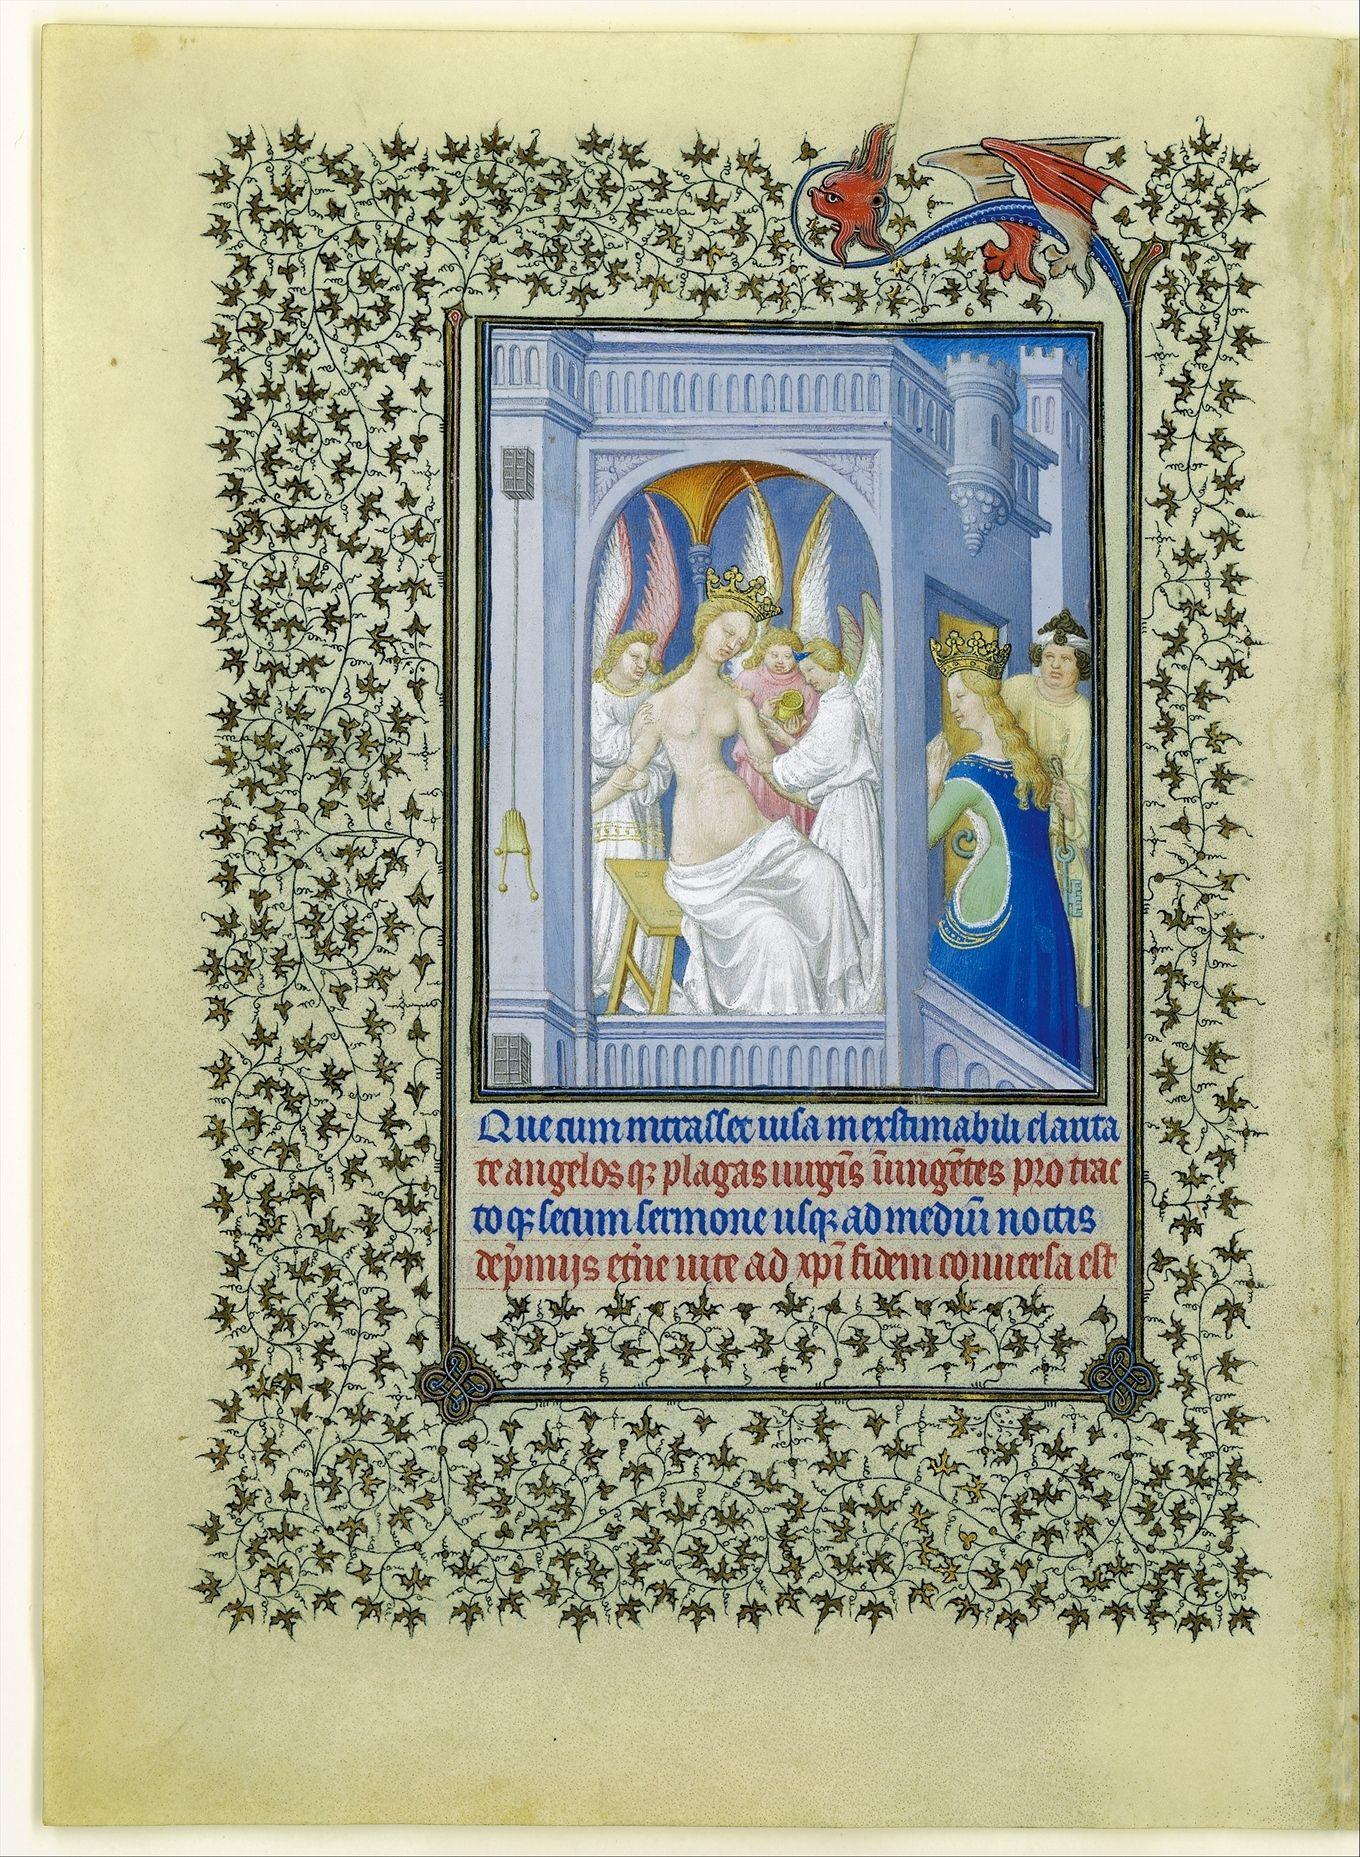 The Belles Heures of Jean de France, Duc de Berry, illuminator: 1405–1408/1409, Herman, Paul and Jean de Limbourg (1399–1416)